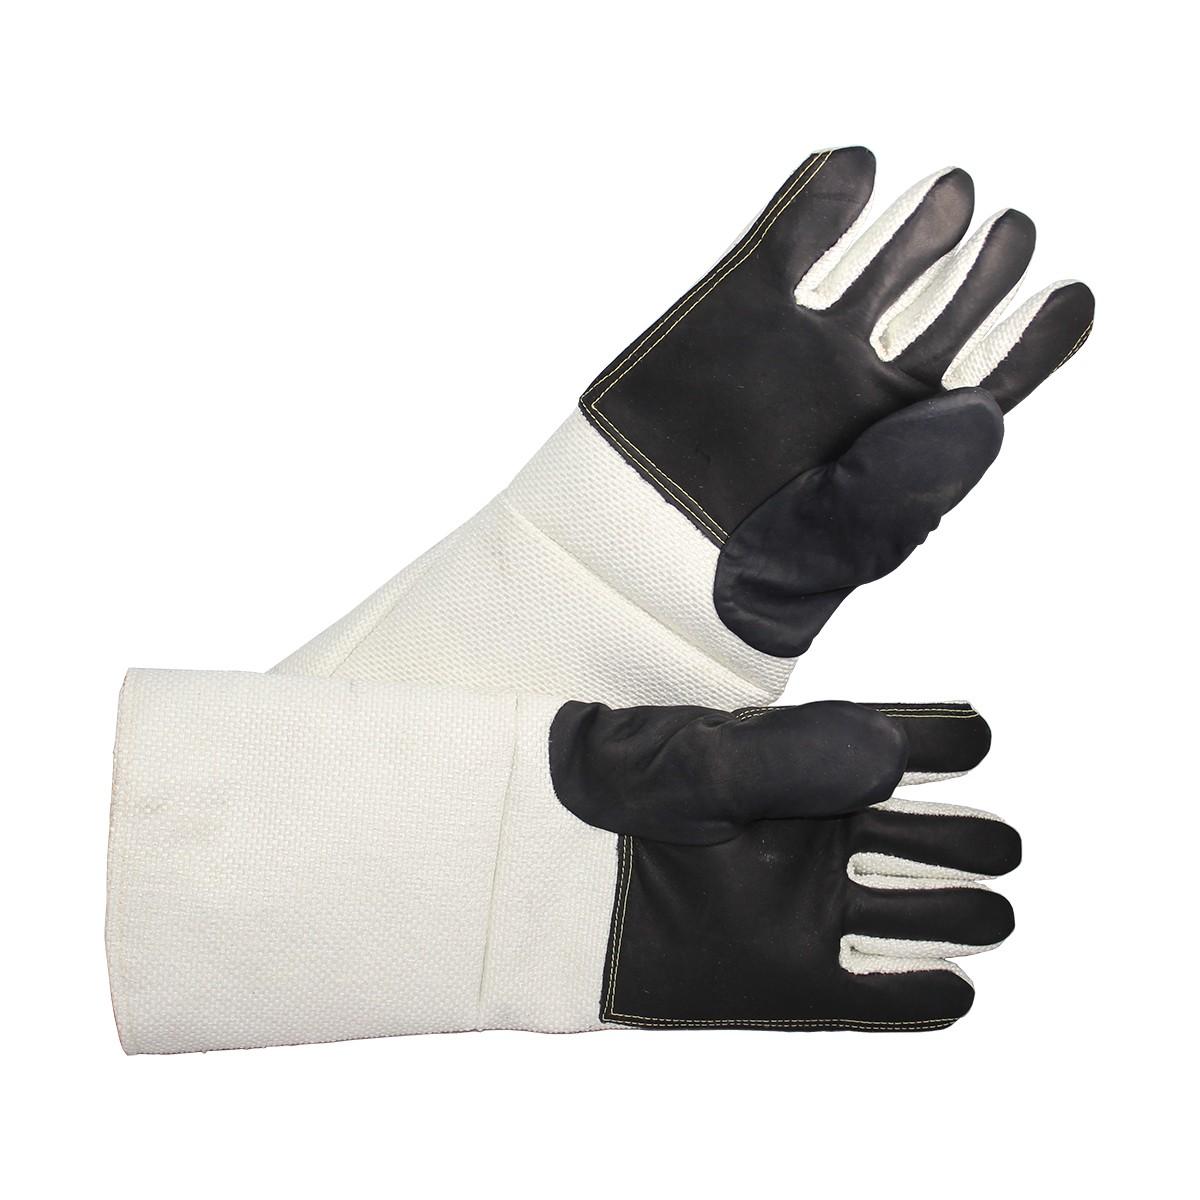 "Pair of 18"" White Non-Asbestos, Leather Palm Gloves Pair"